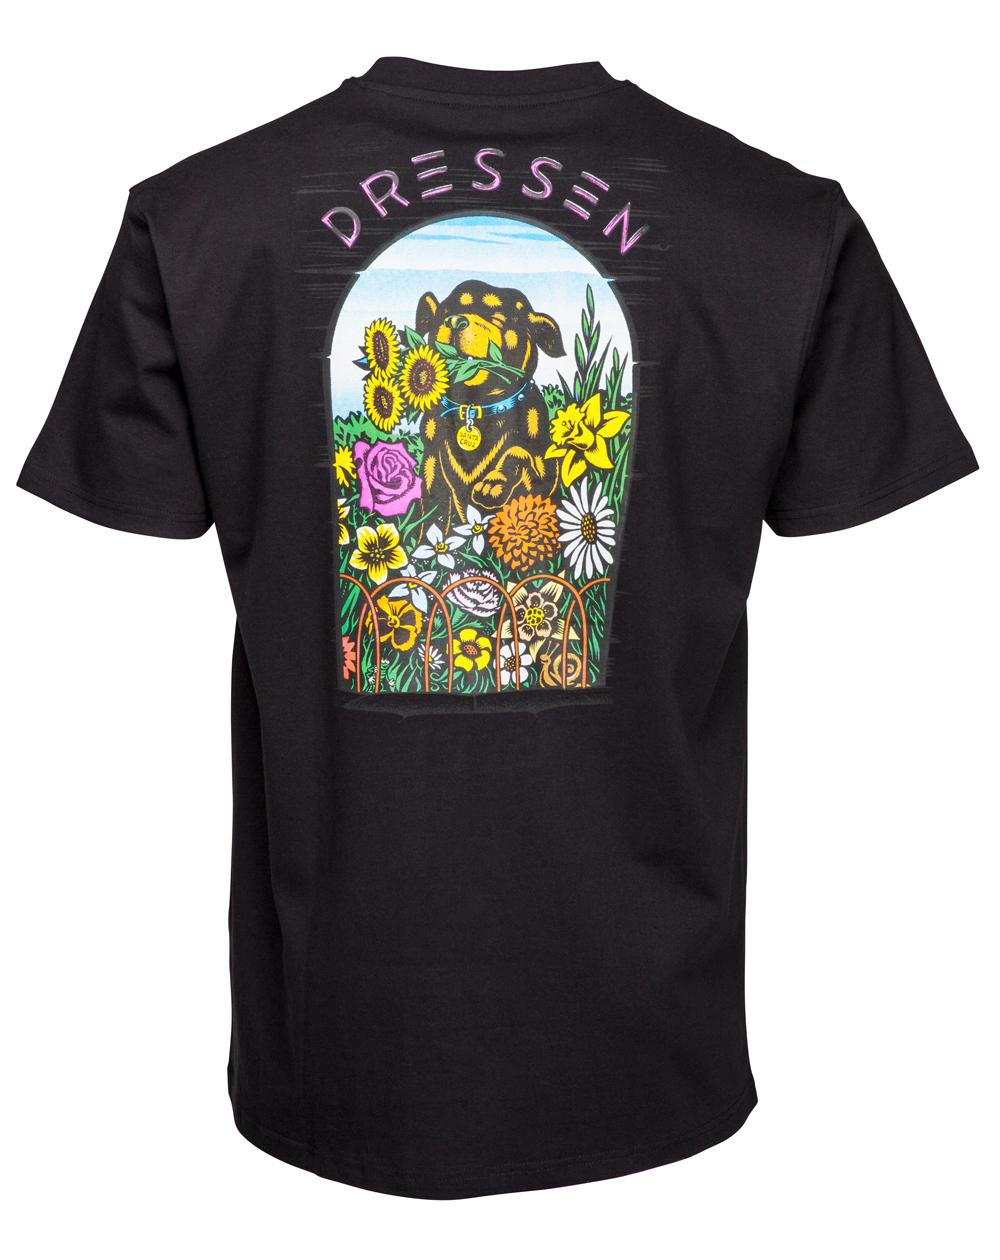 Santa Cruz OGSC Dressen Pup T-Shirt Homme Black